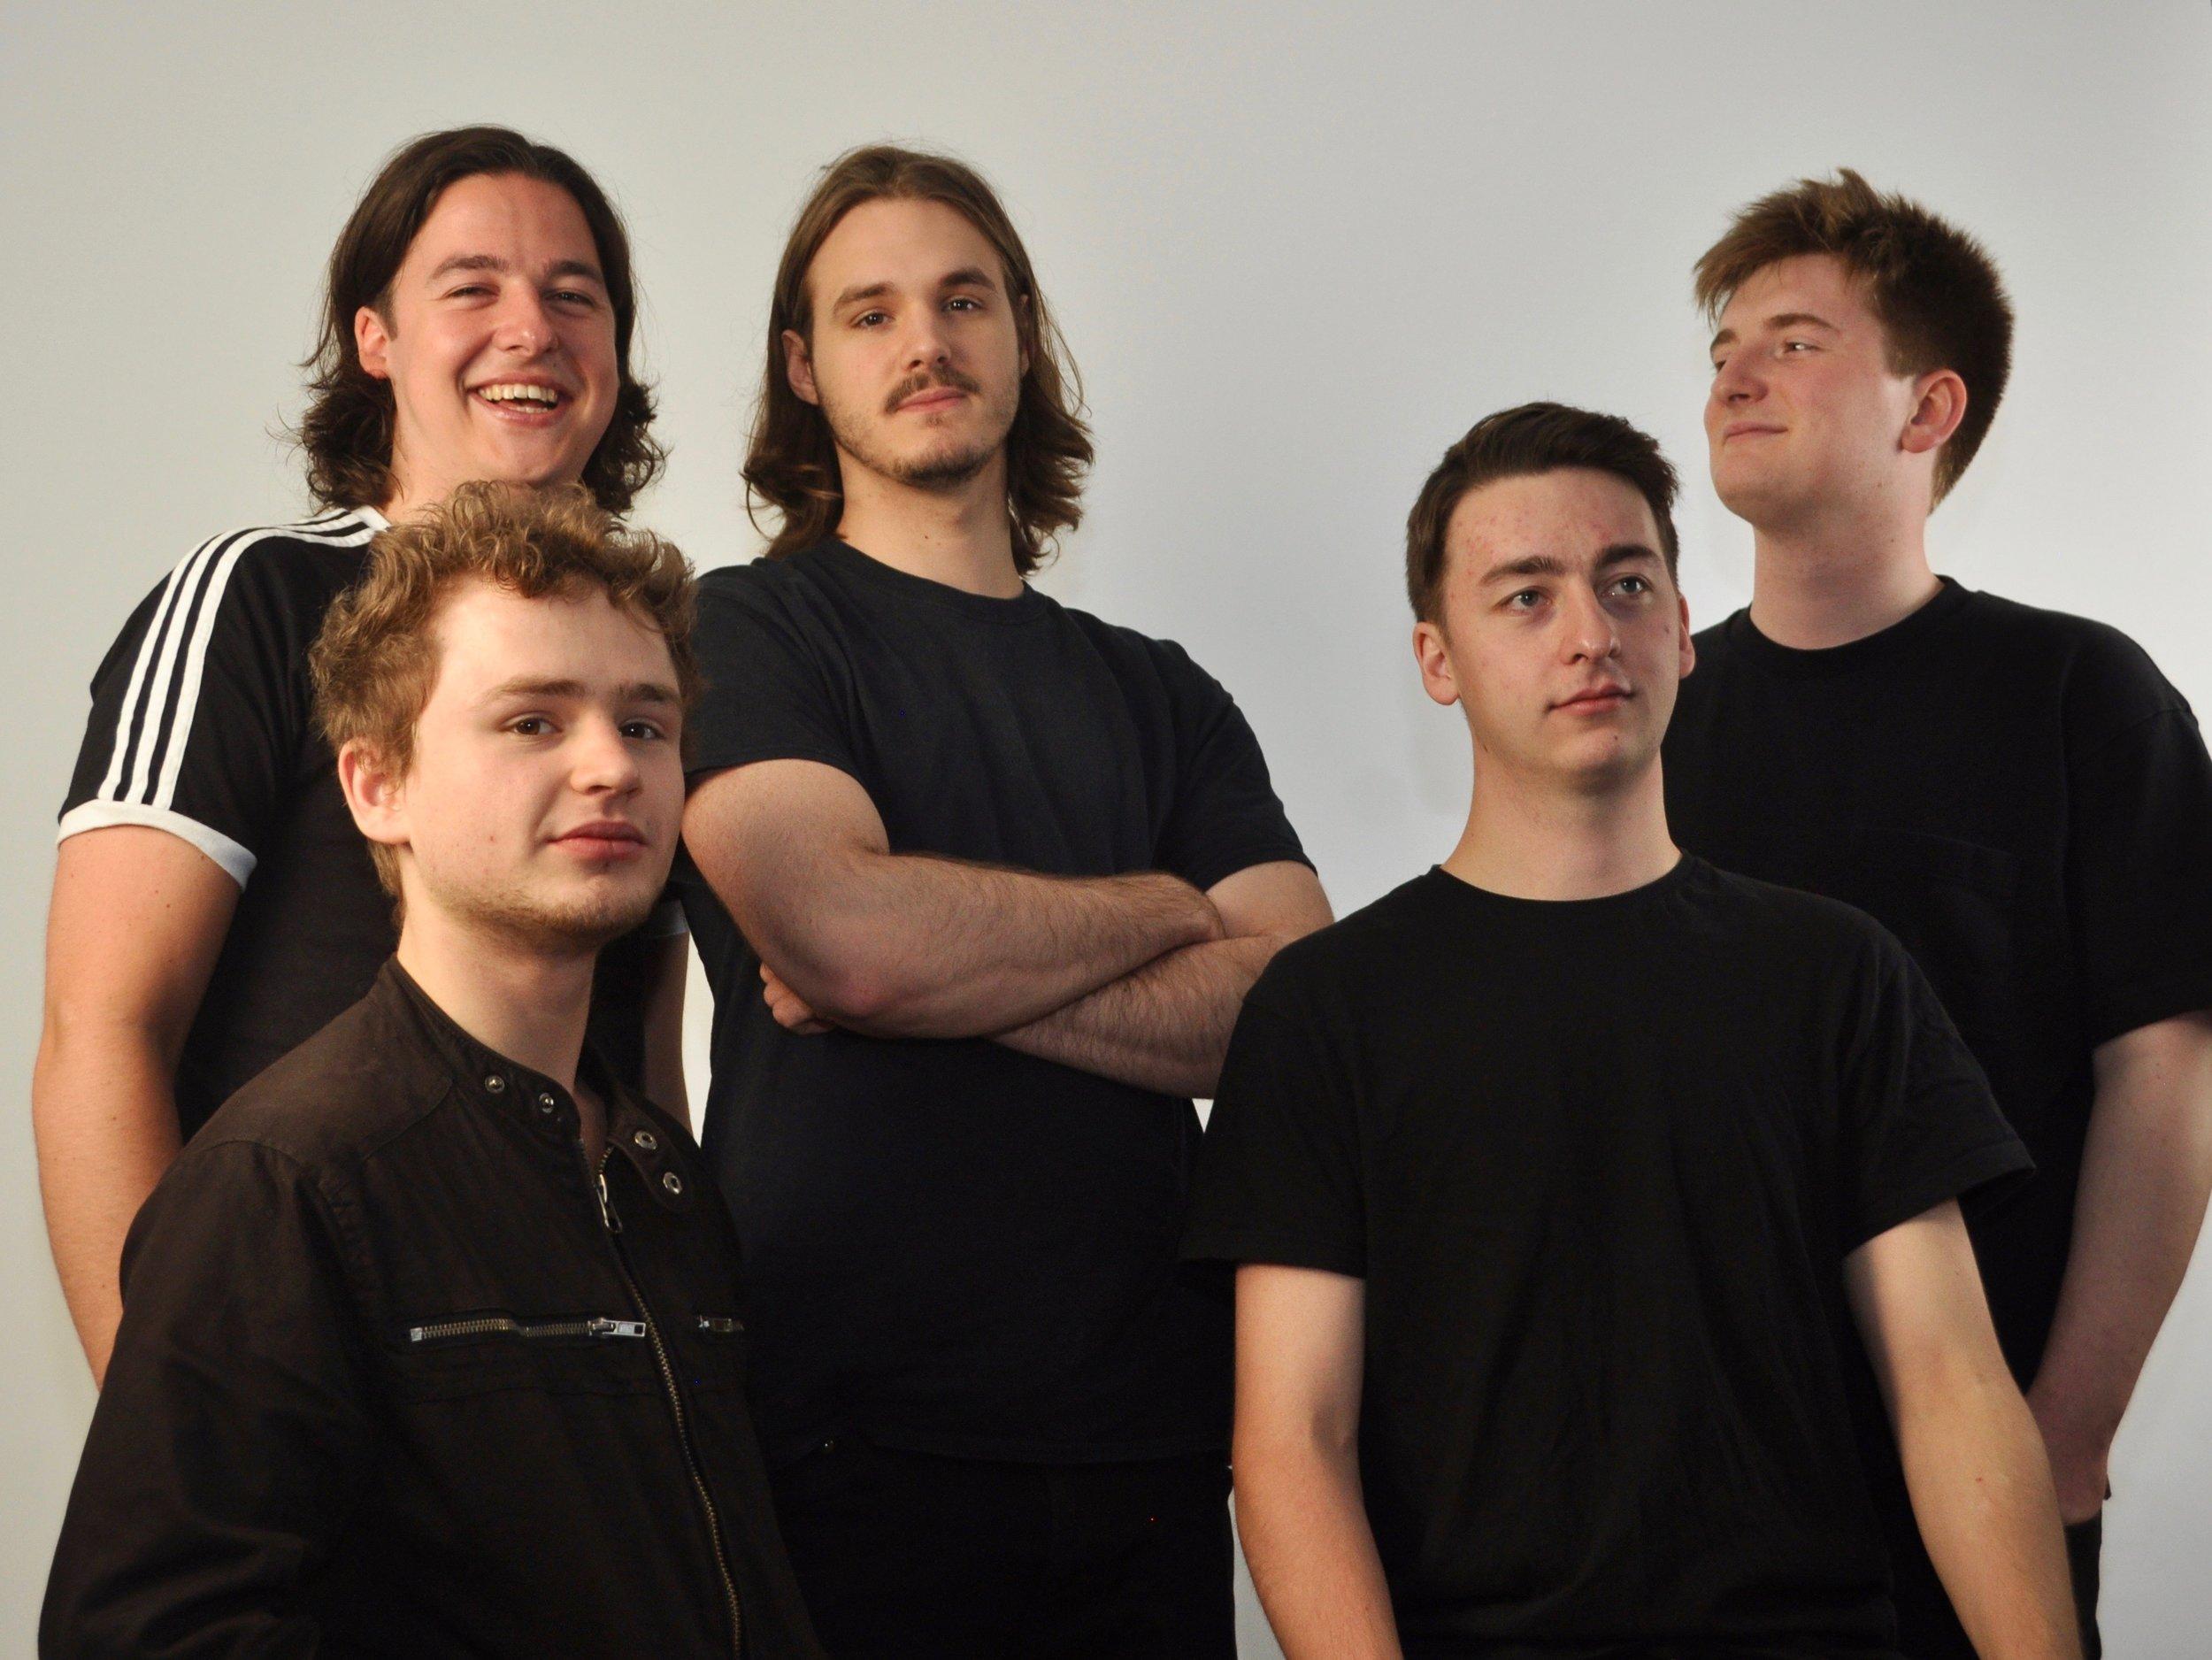 Rory Ingham (trombone), Toby Comeau (keys), Joe Lee `(bass), Dom Ingham (violin/vocals), Jonny Mansfield (drums/vibes).